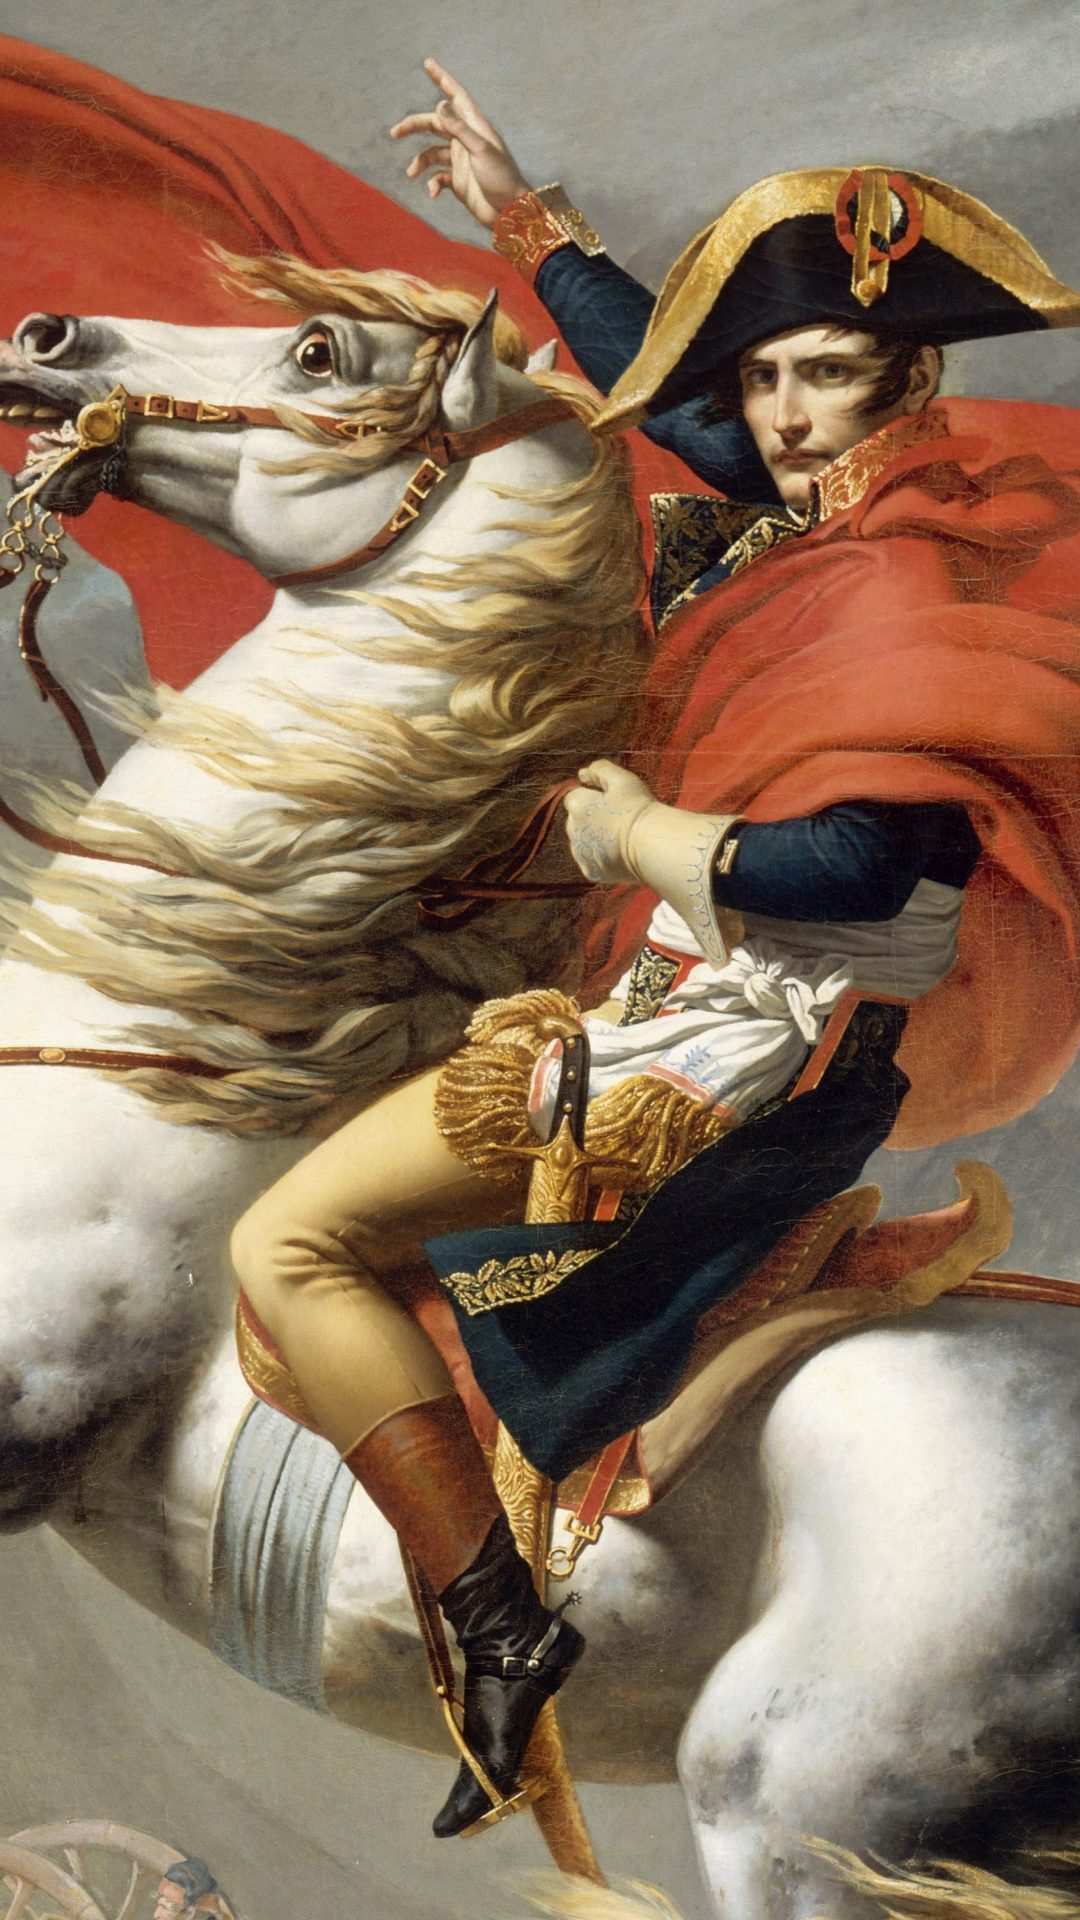 Napoleon Crossing The Alps 2 4k Uhd Wallpaper